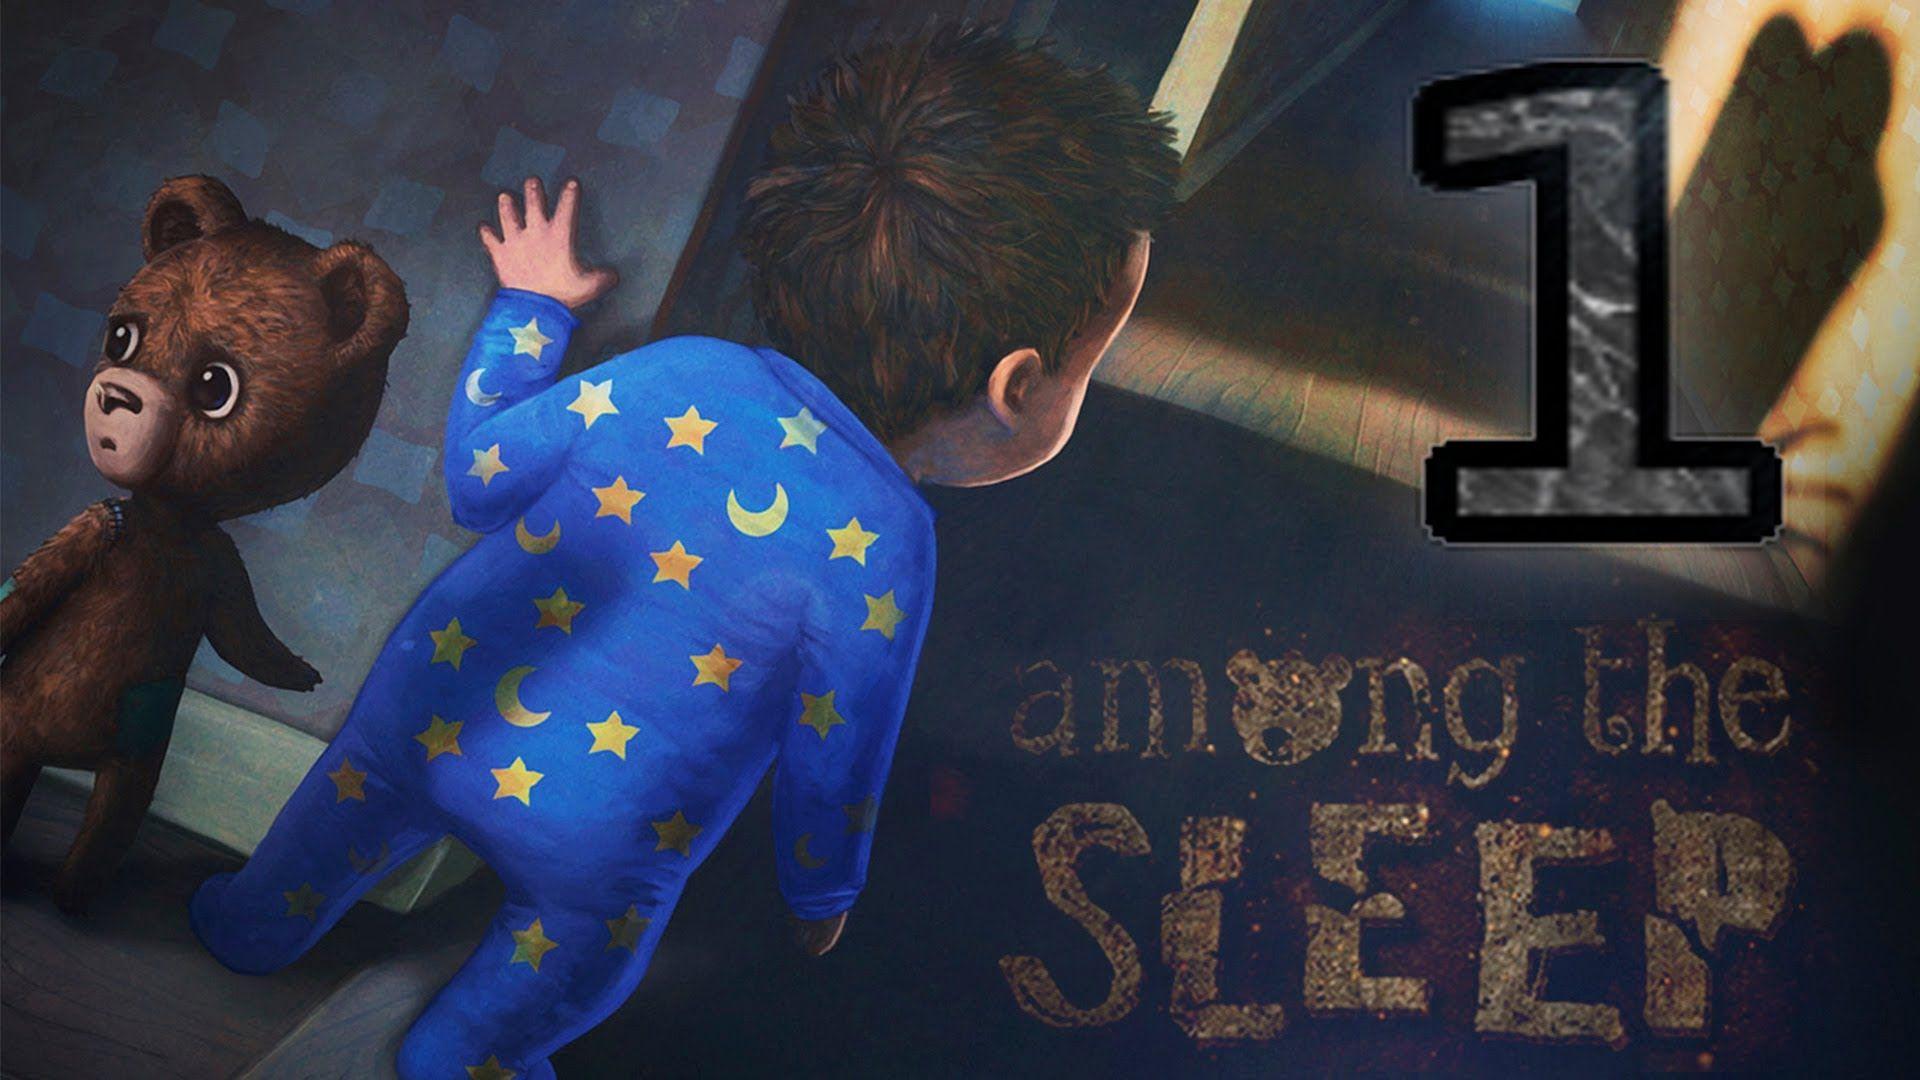 Creepy Bear Among the Sleep Part 1 LIKE COMMENT AND